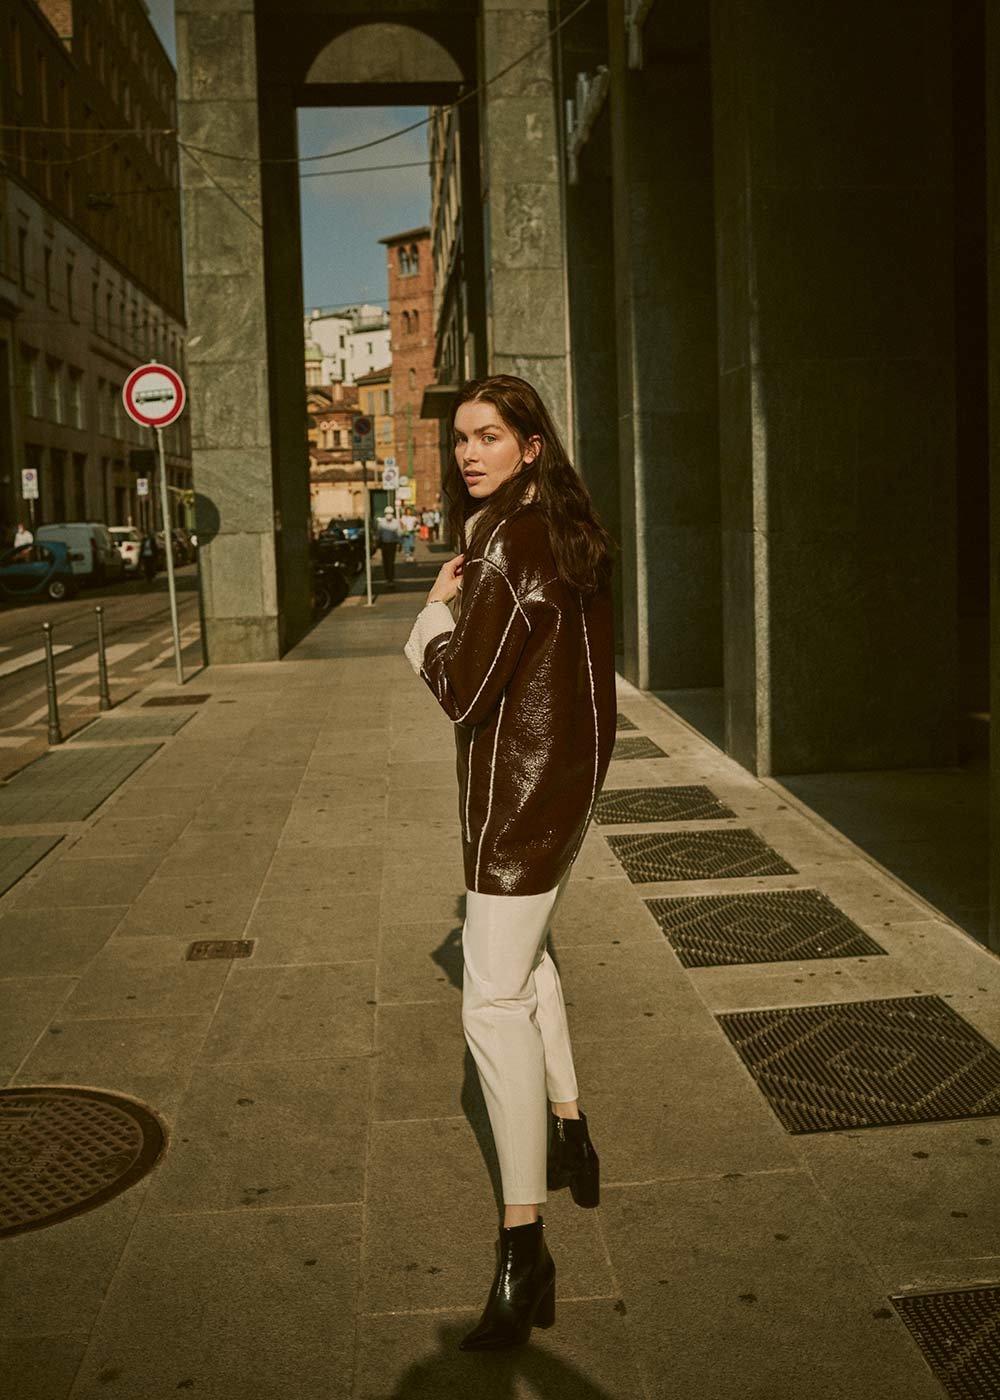 Gyllis patent -leather jacket - Marrone\ White - Woman